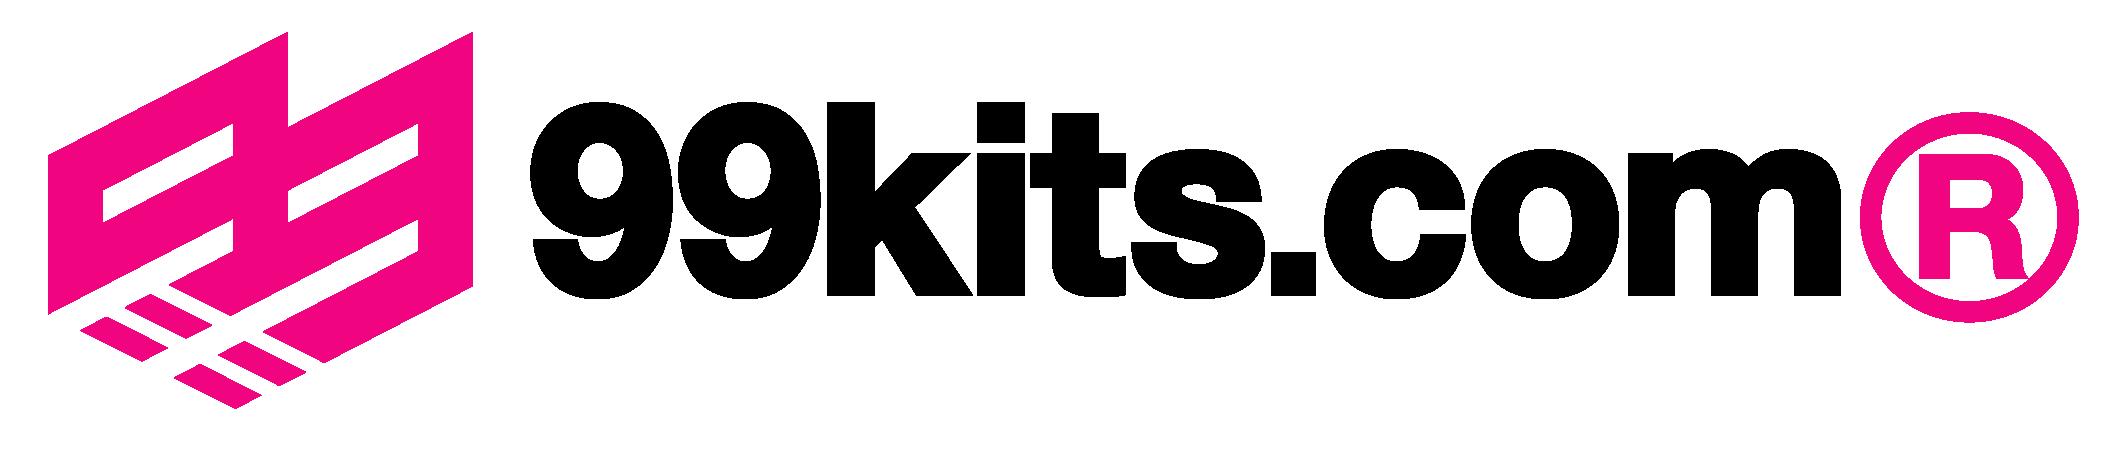 99kits Logo